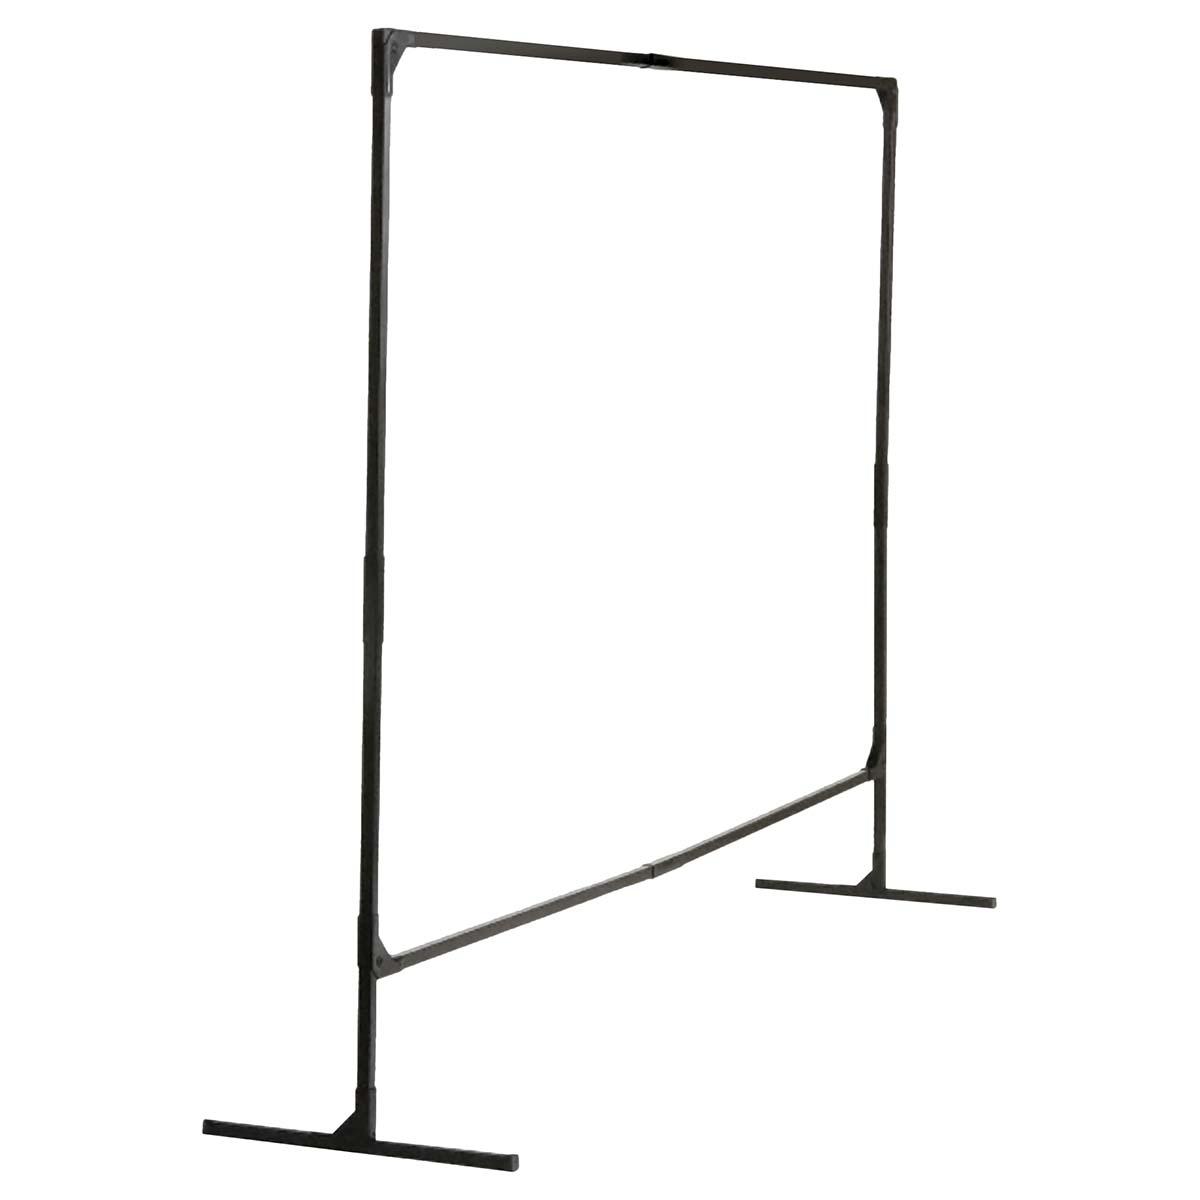 Wilson Stur-D-Screen Frame (36338), 6 x 8 feet, Single Panel, T Legs, Black, For Welding Curtains, 1 / Order